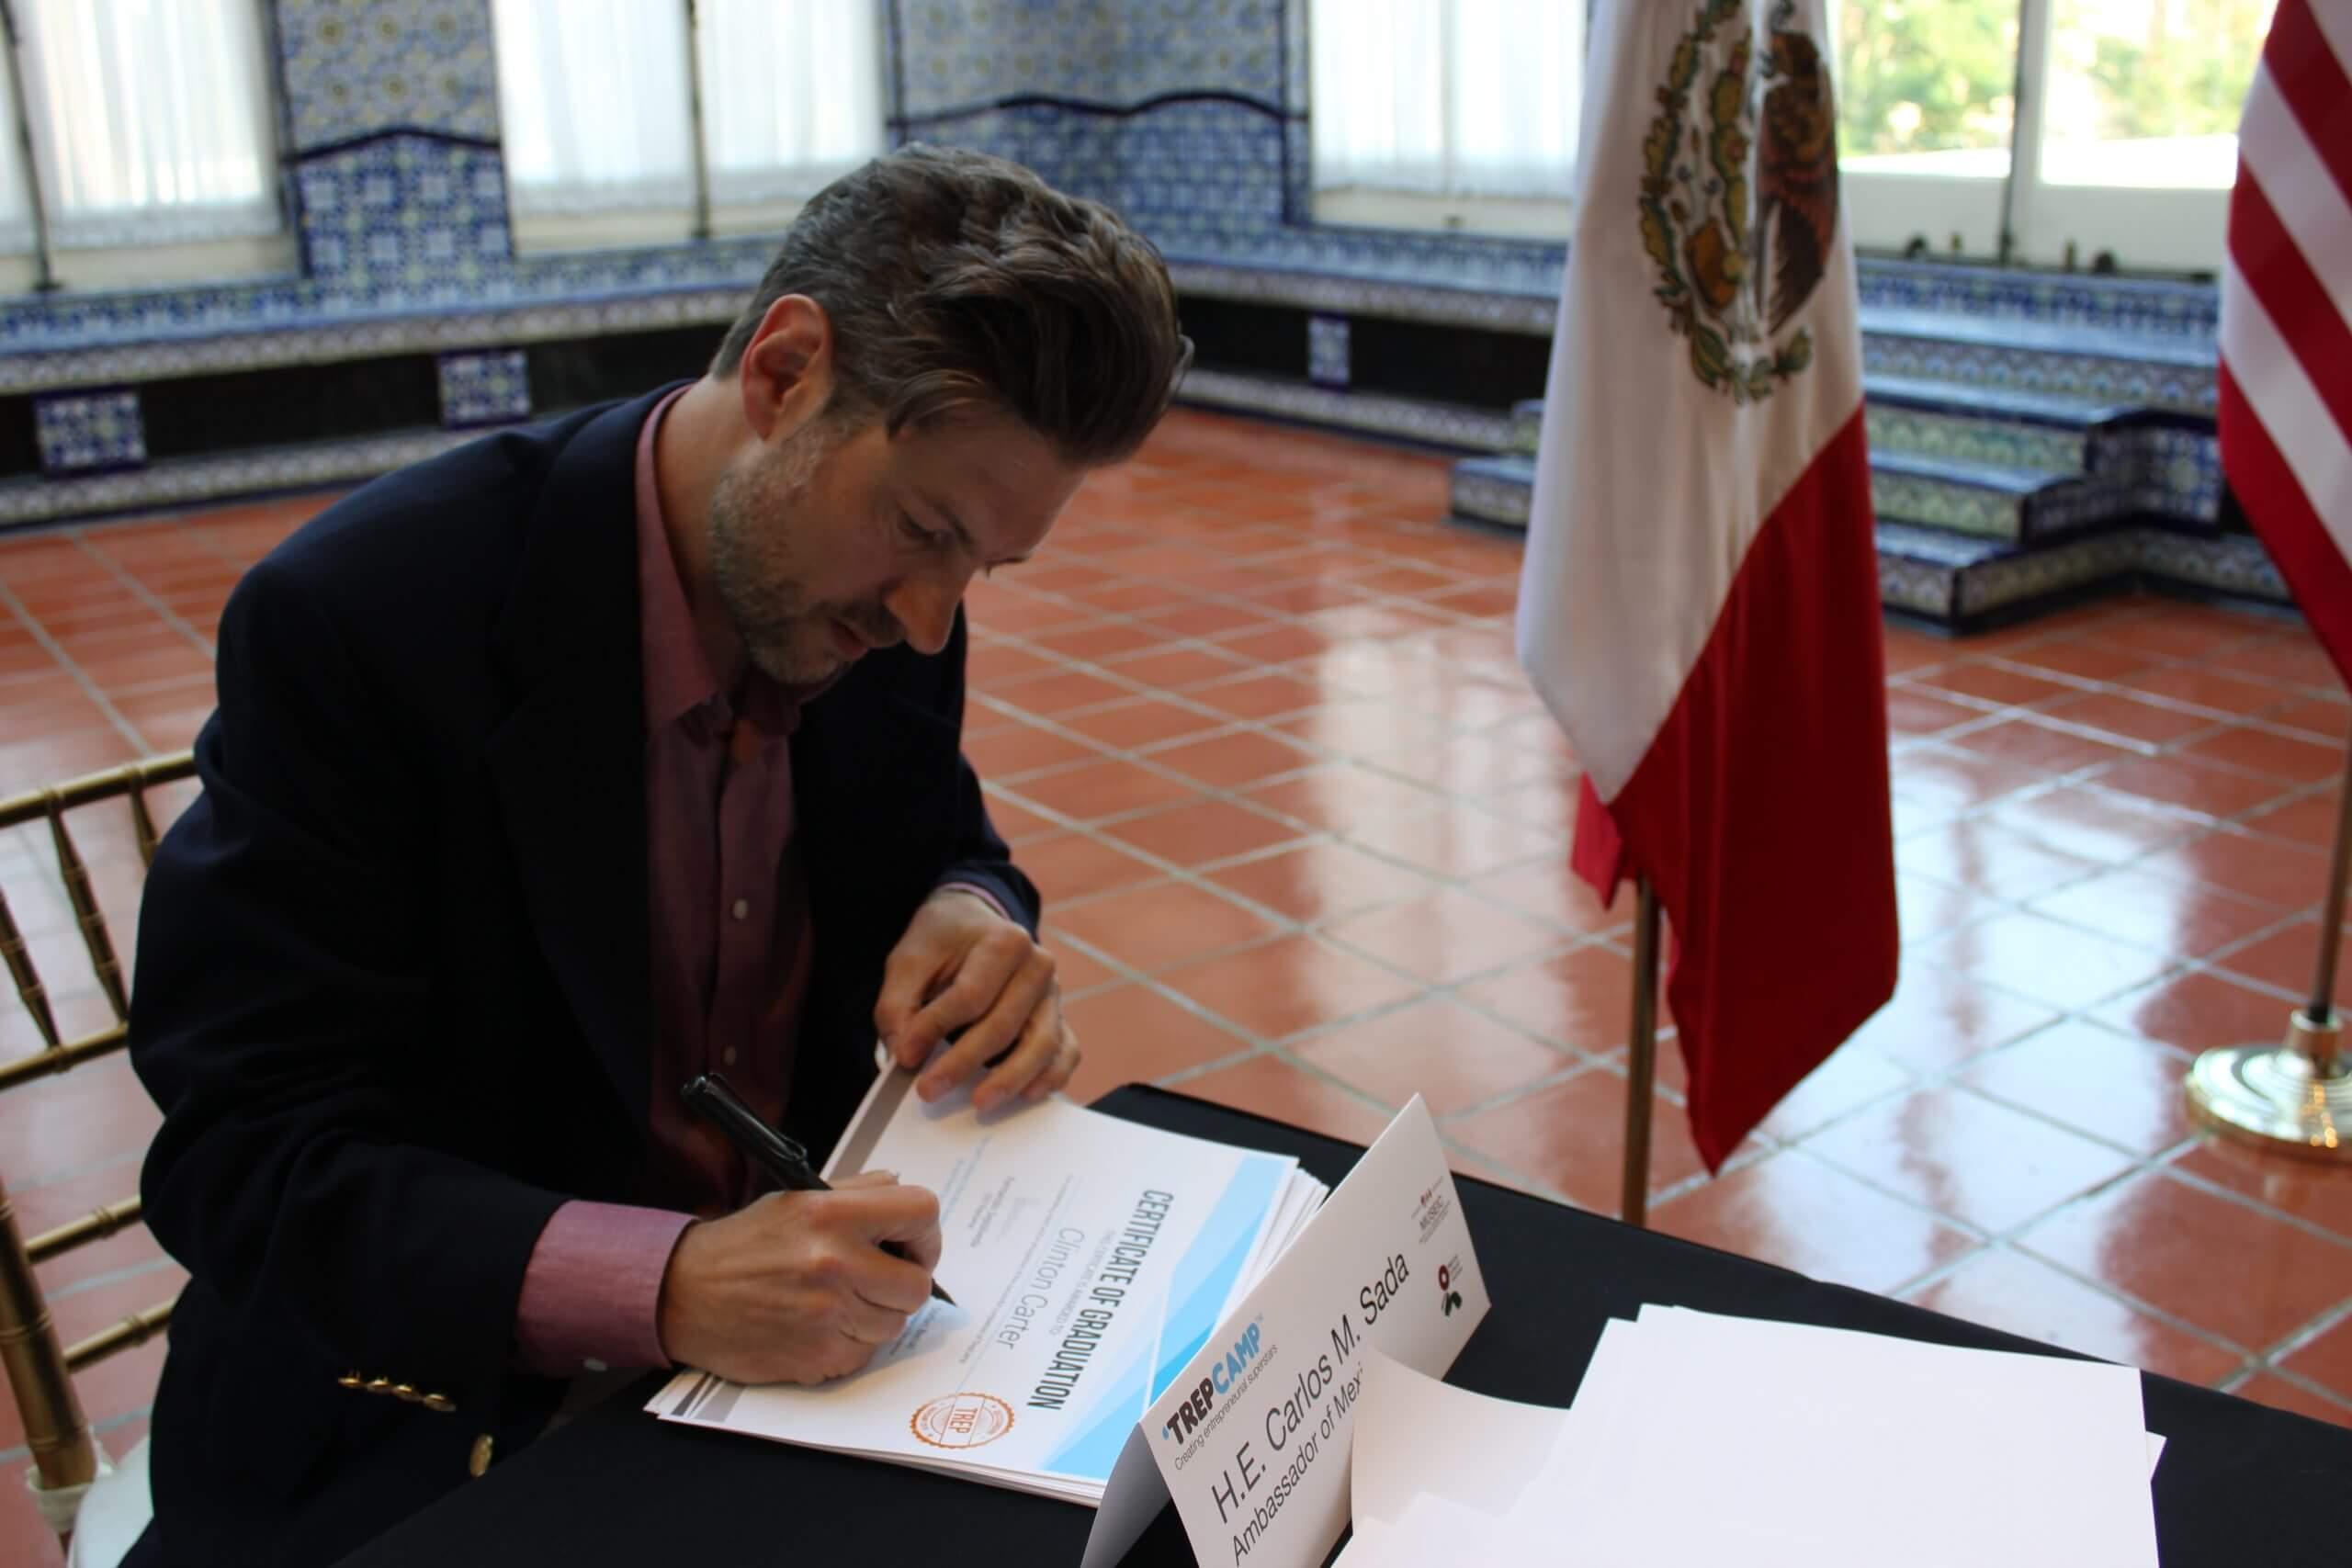 Stefan signs diplomas